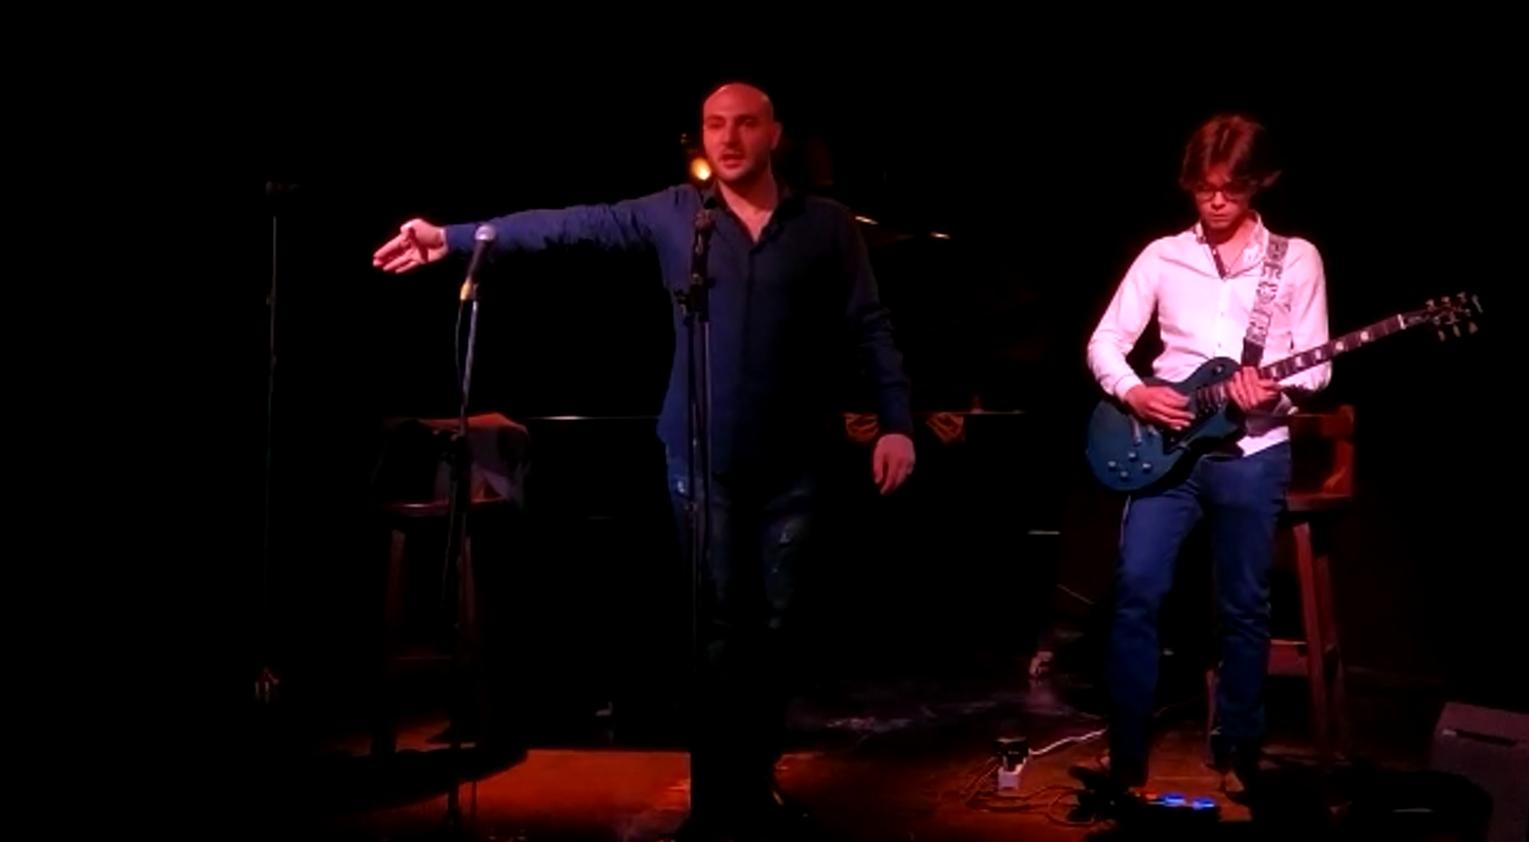 RICERCANDO L'AMORE  concerto - spettacolo con Davide Campolo e Gianluca Sierra